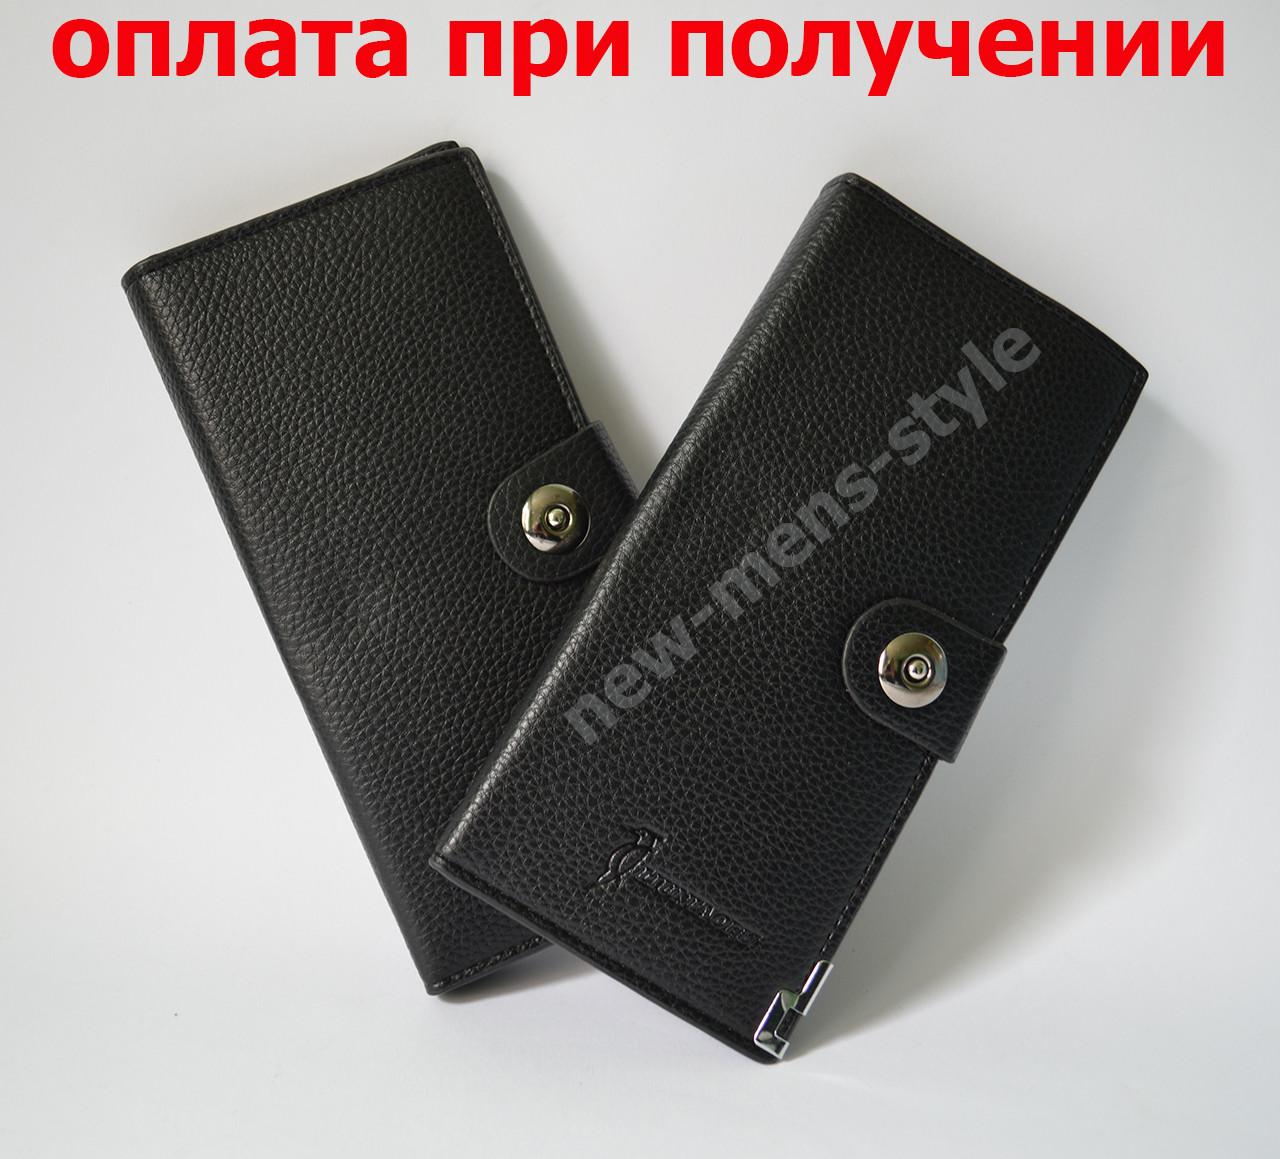 Мужской кожаный кошелек портмоне гаманець бумажник Liuniaofu шкіряній